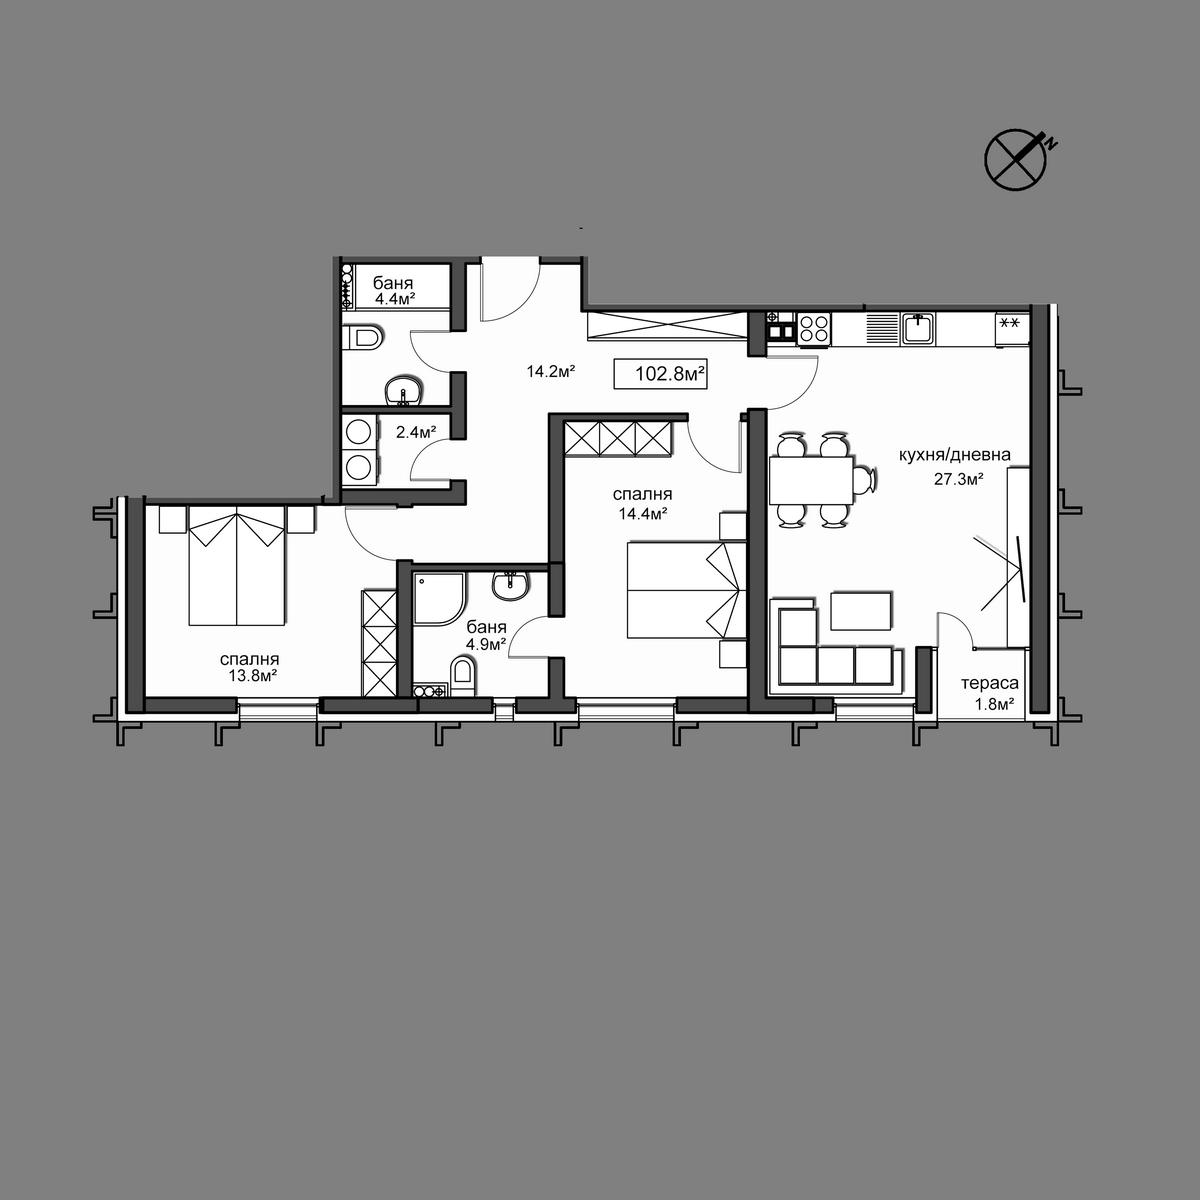 Продава апартамент - Апартамент 43